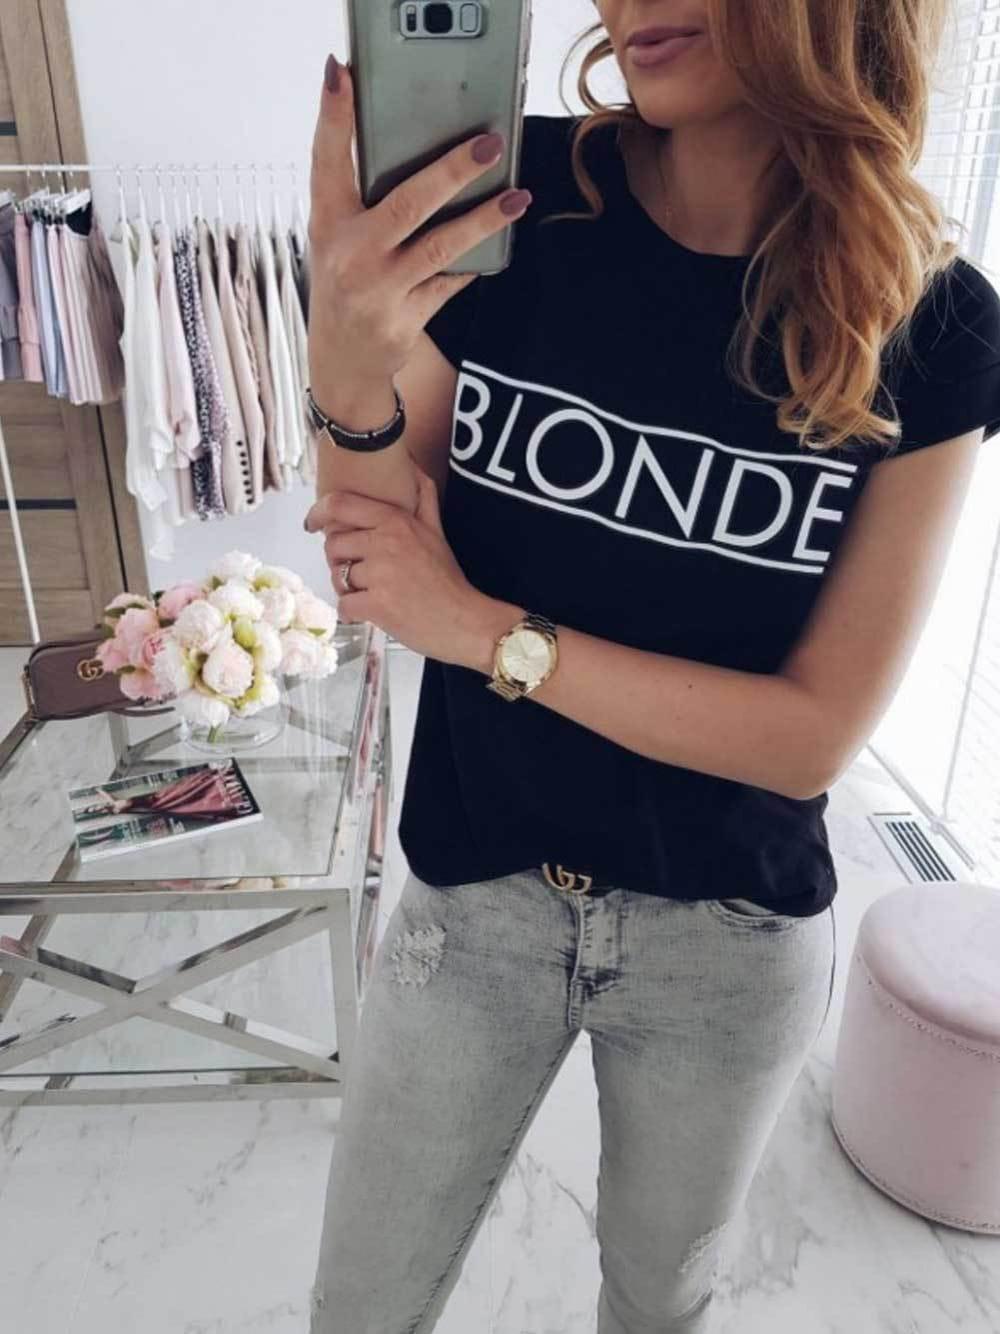 b89ea1a4e T-shirt z napisem BLONDE S-XL 02 - Sklep internetowy Dybcia